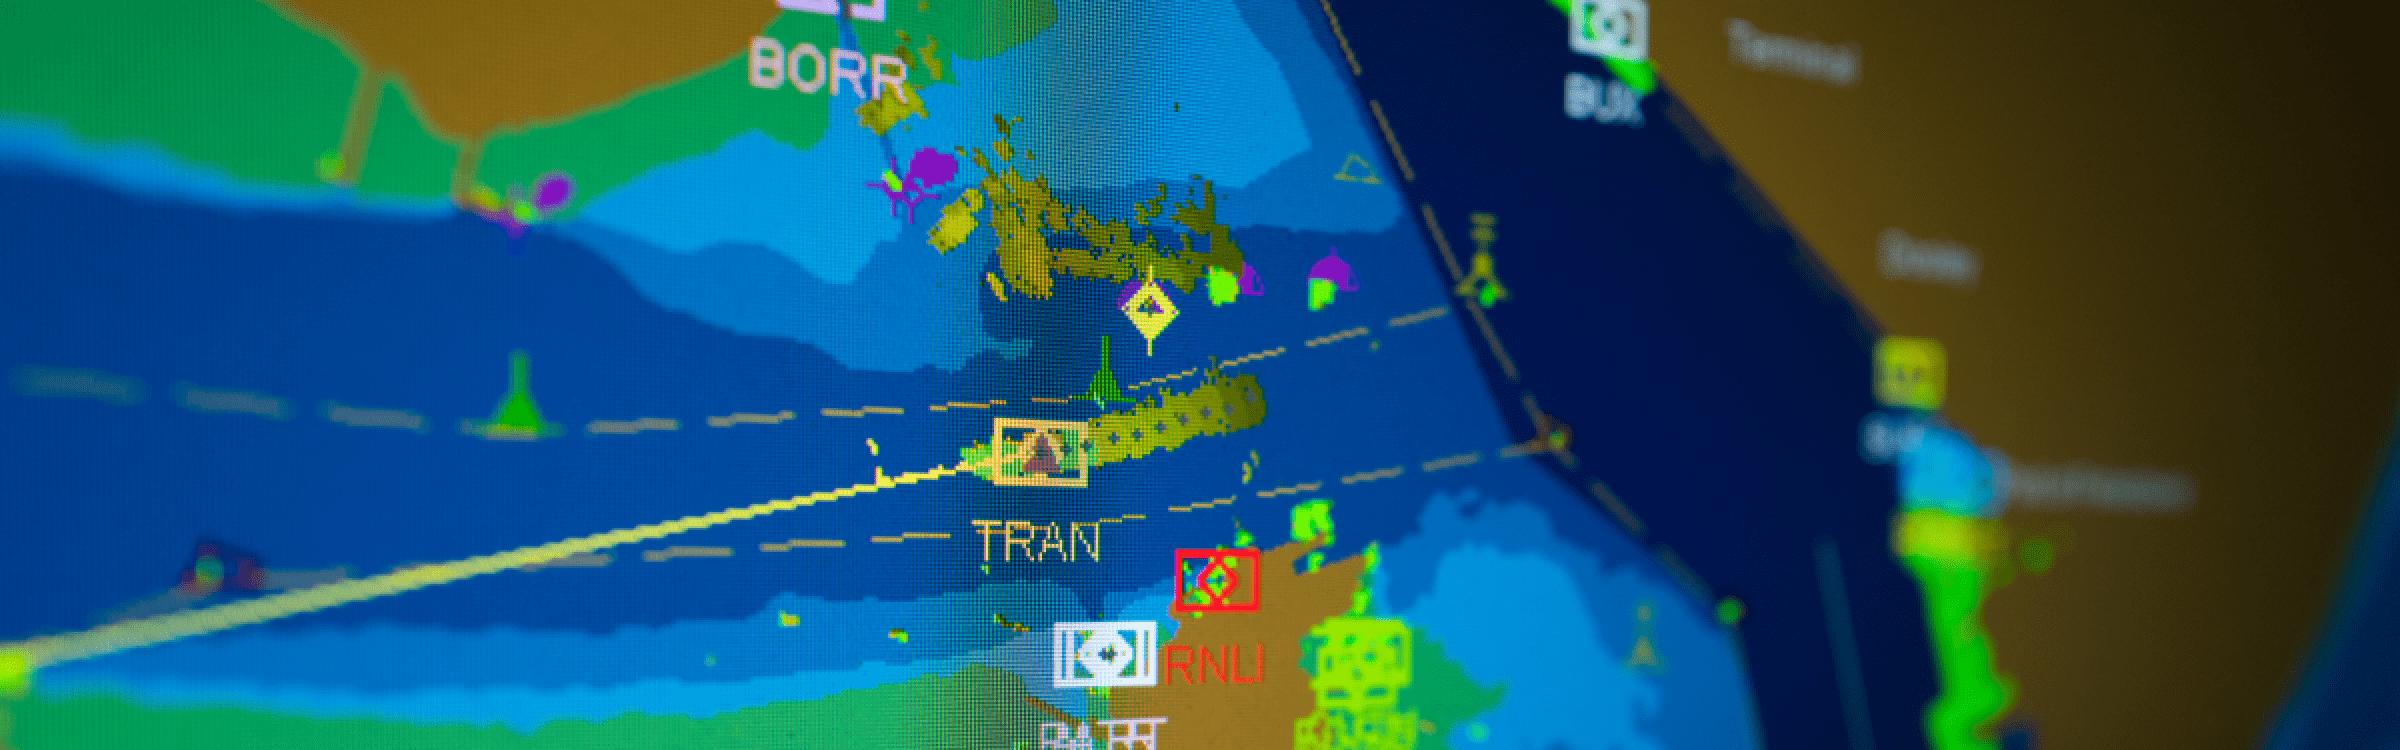 Live Data | Weather, Tide, Sailing information - Harwich, Felixstowe